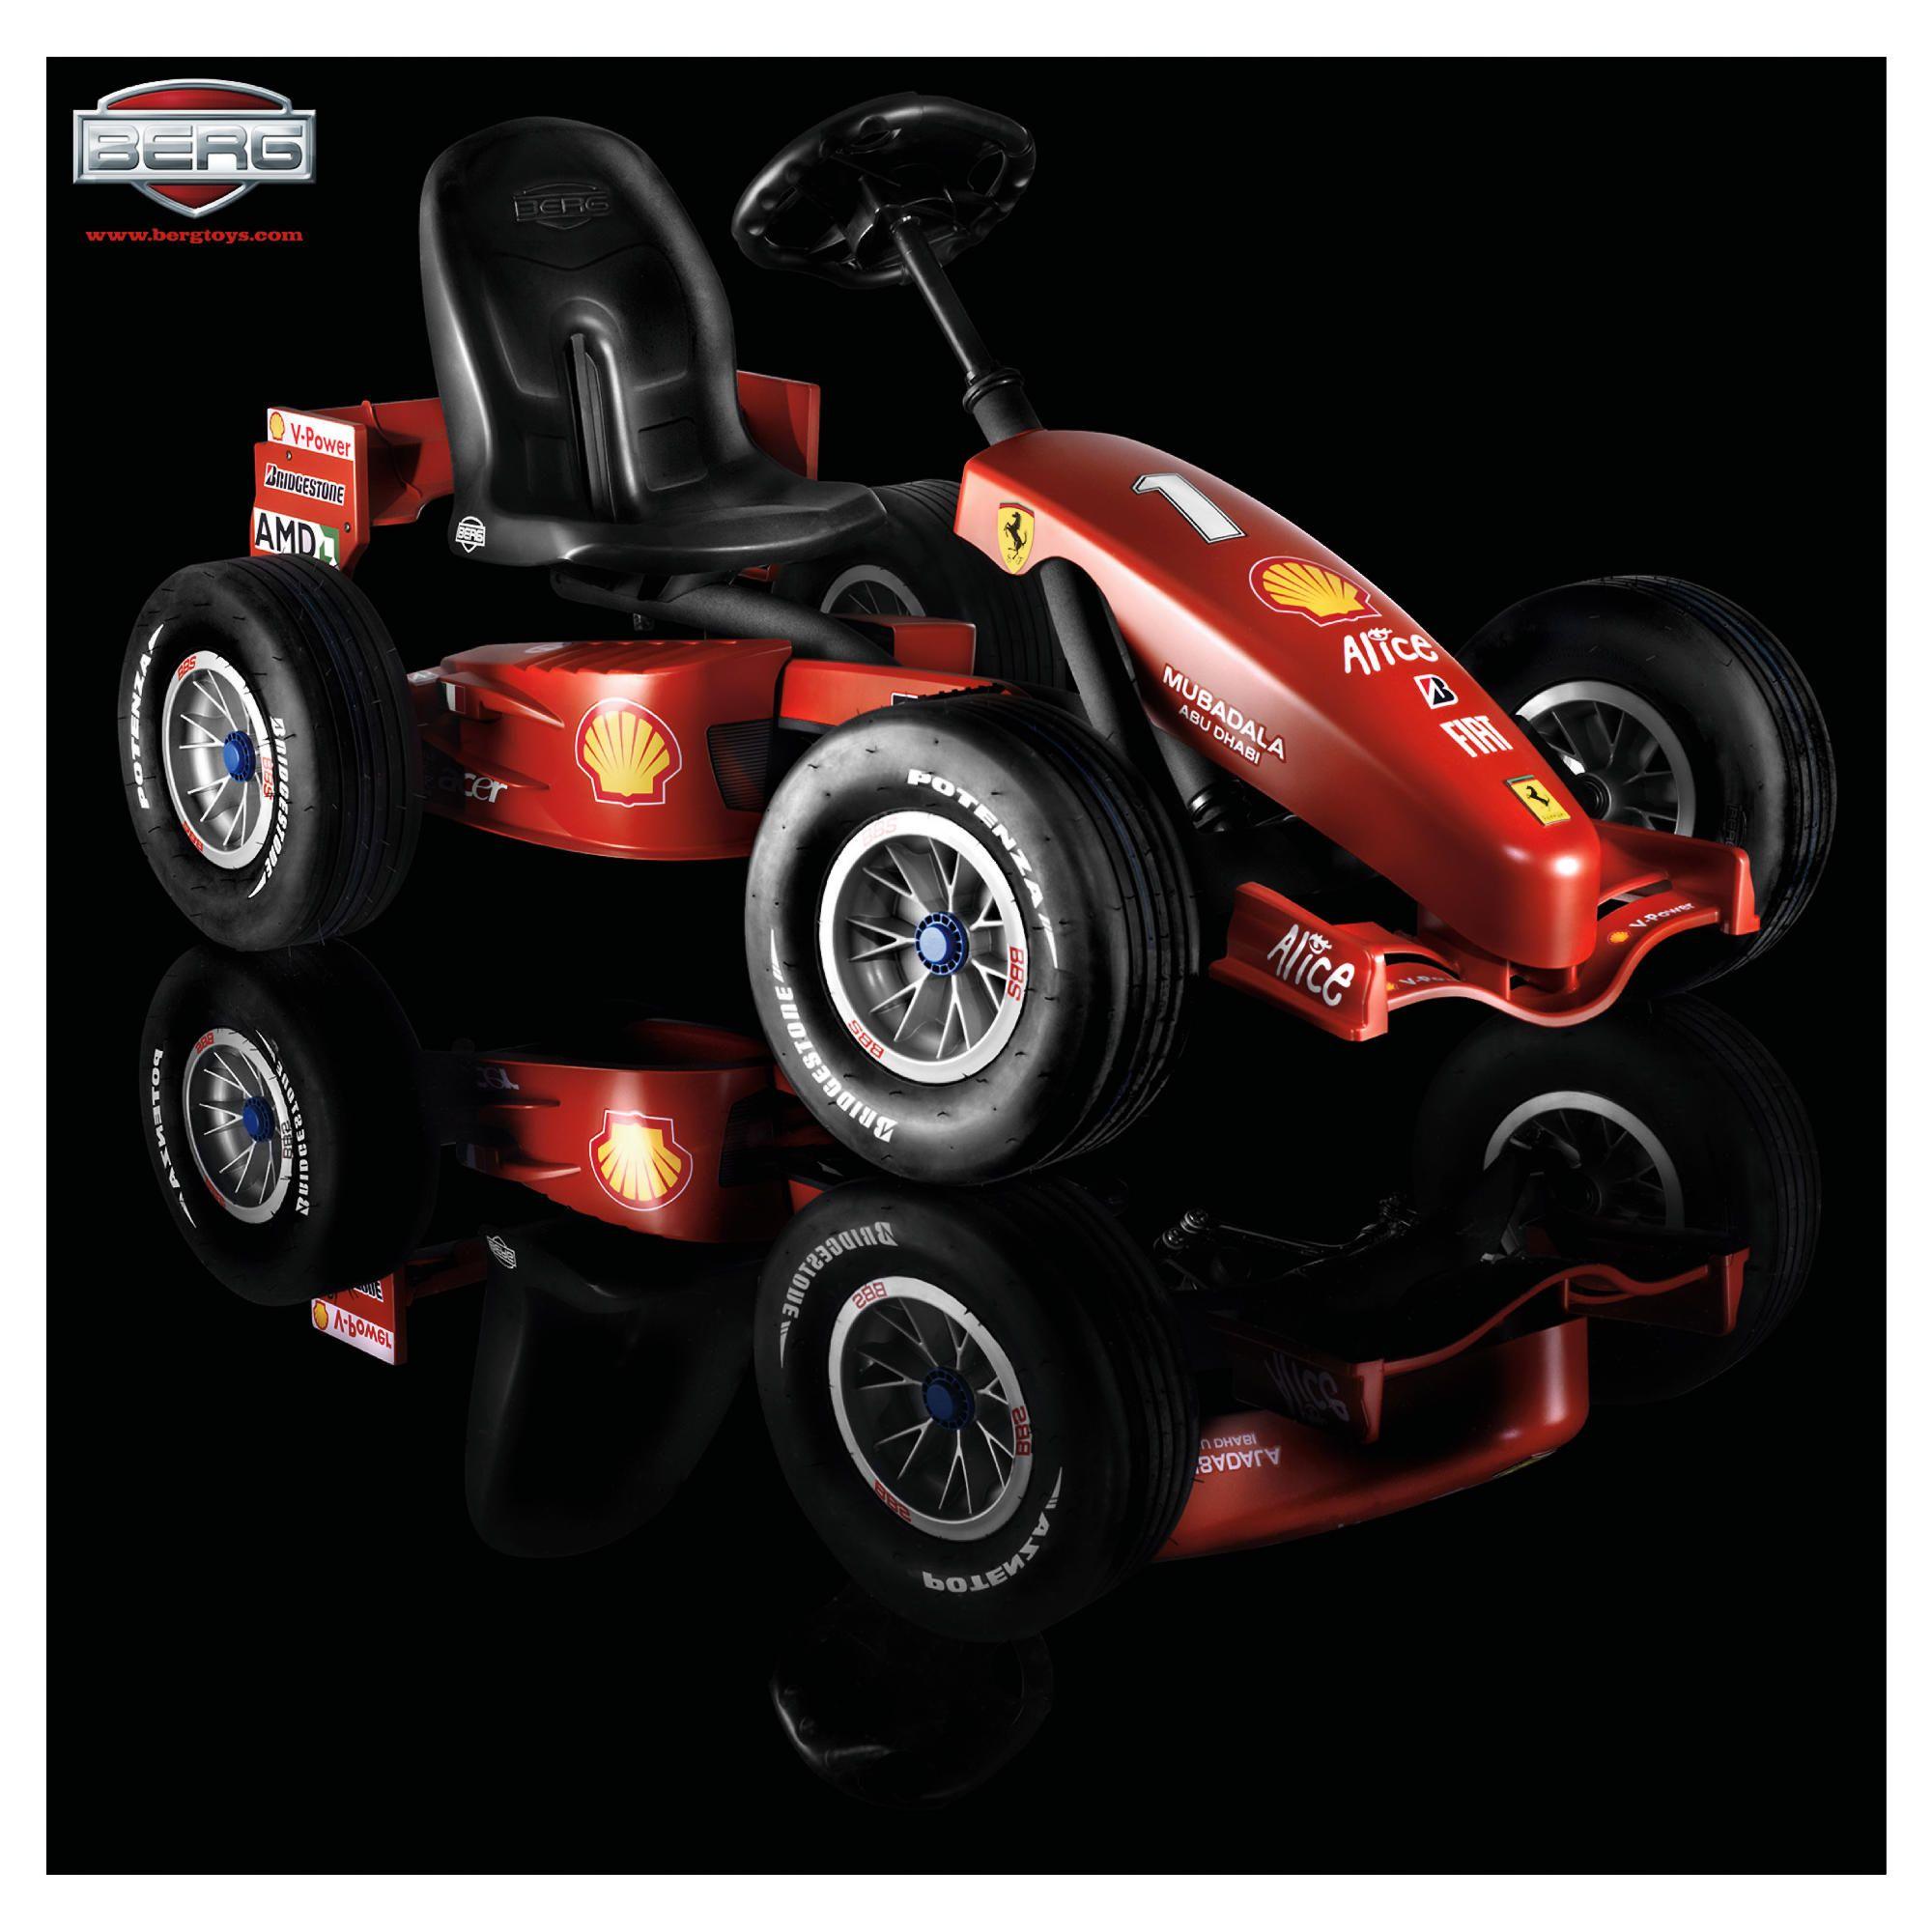 Berg Ferrari F1 Buddy Ride-On Go Kart at Tesco Direct